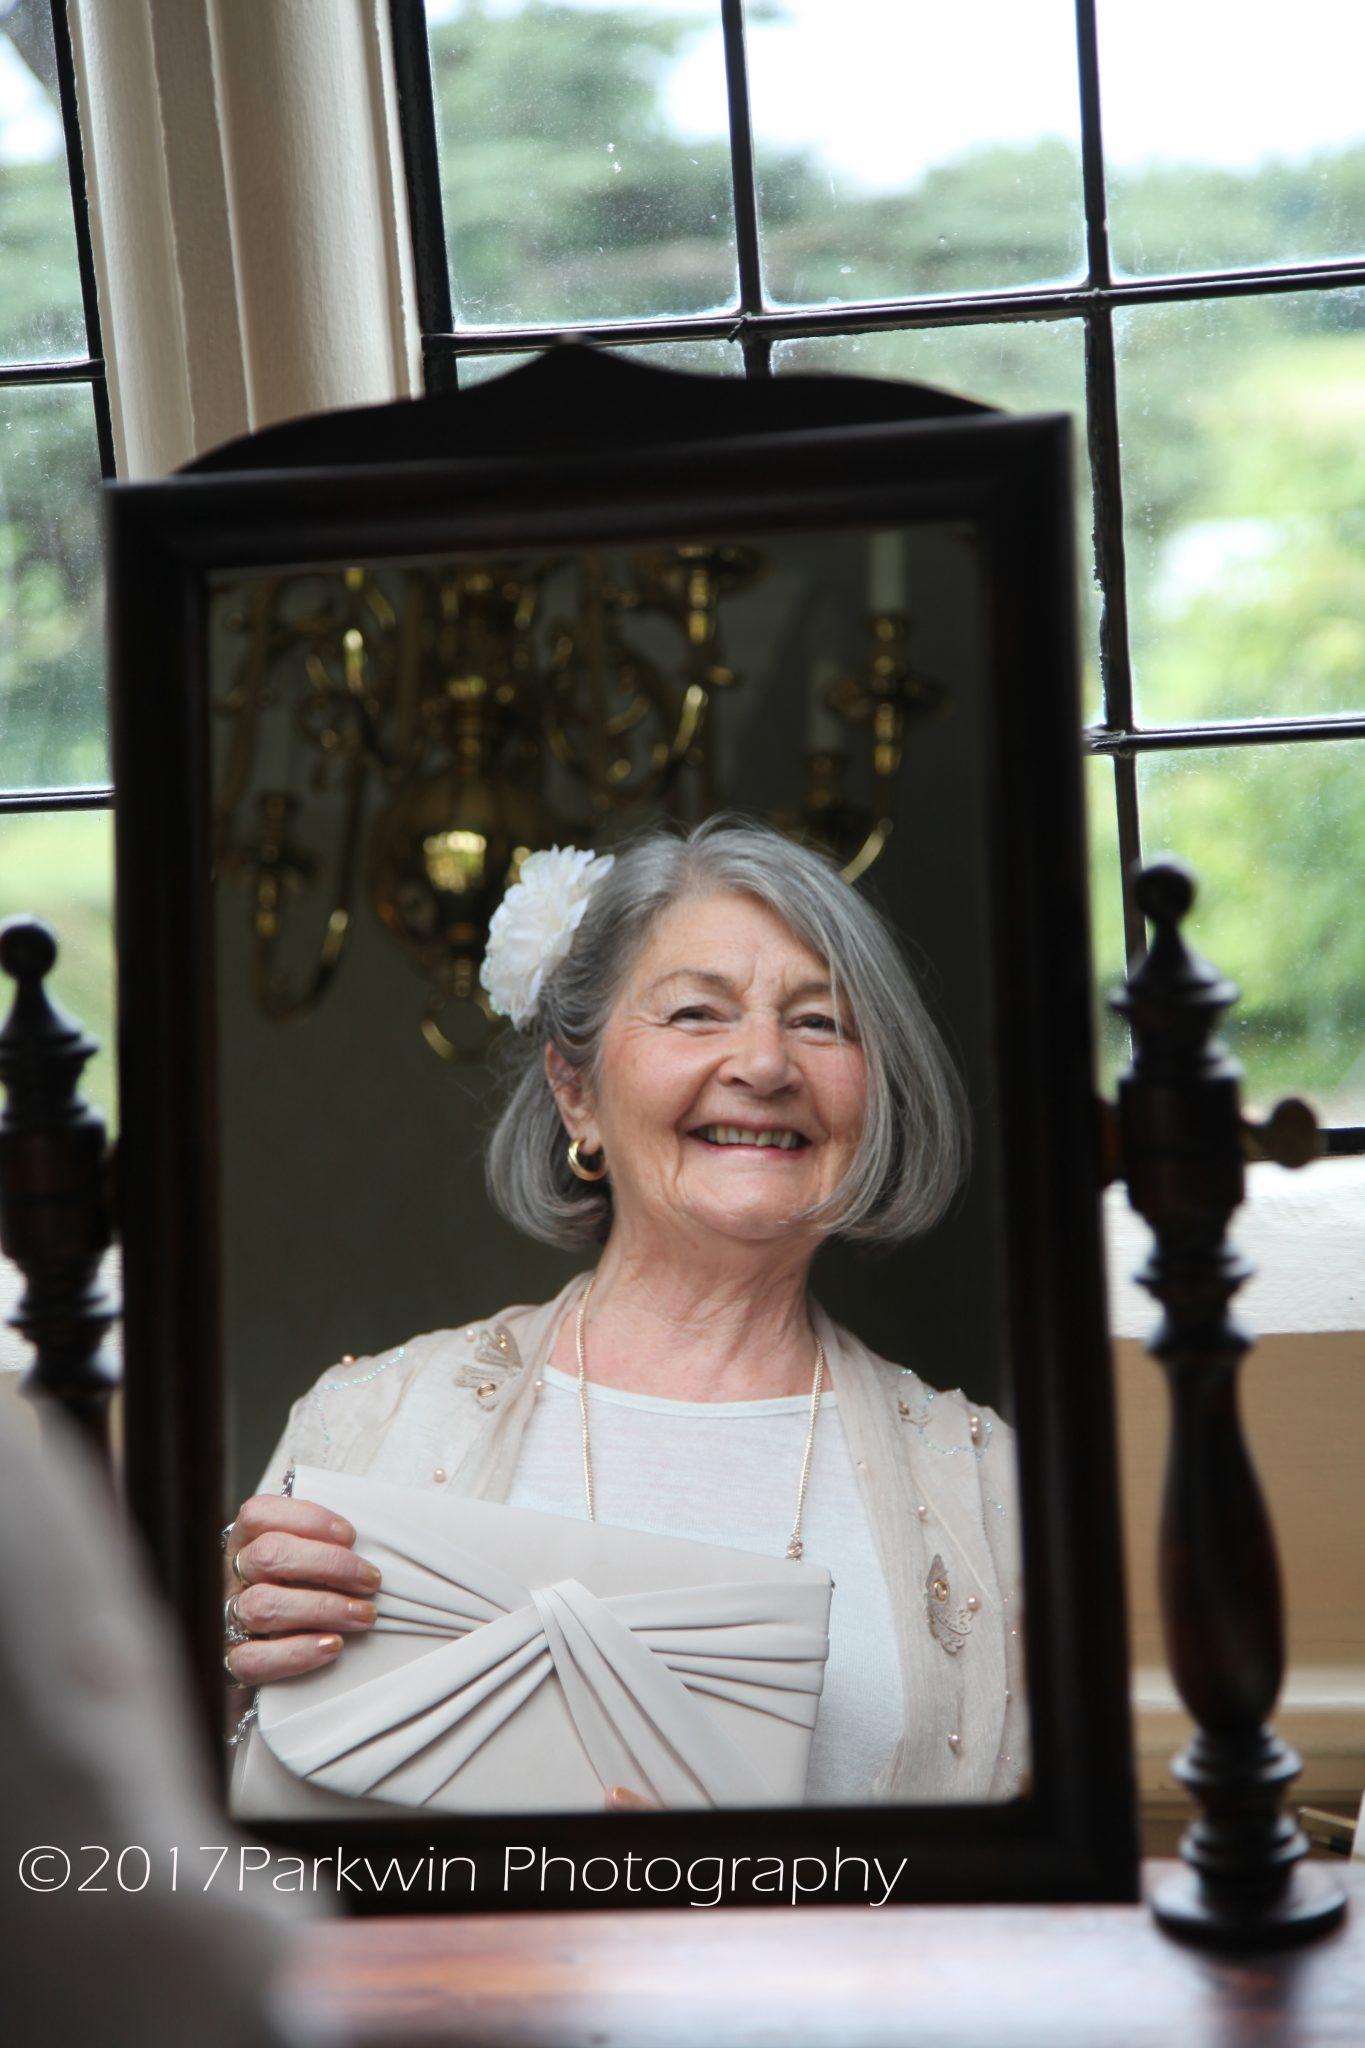 Grandma looking in mirror at Hanbury Manor